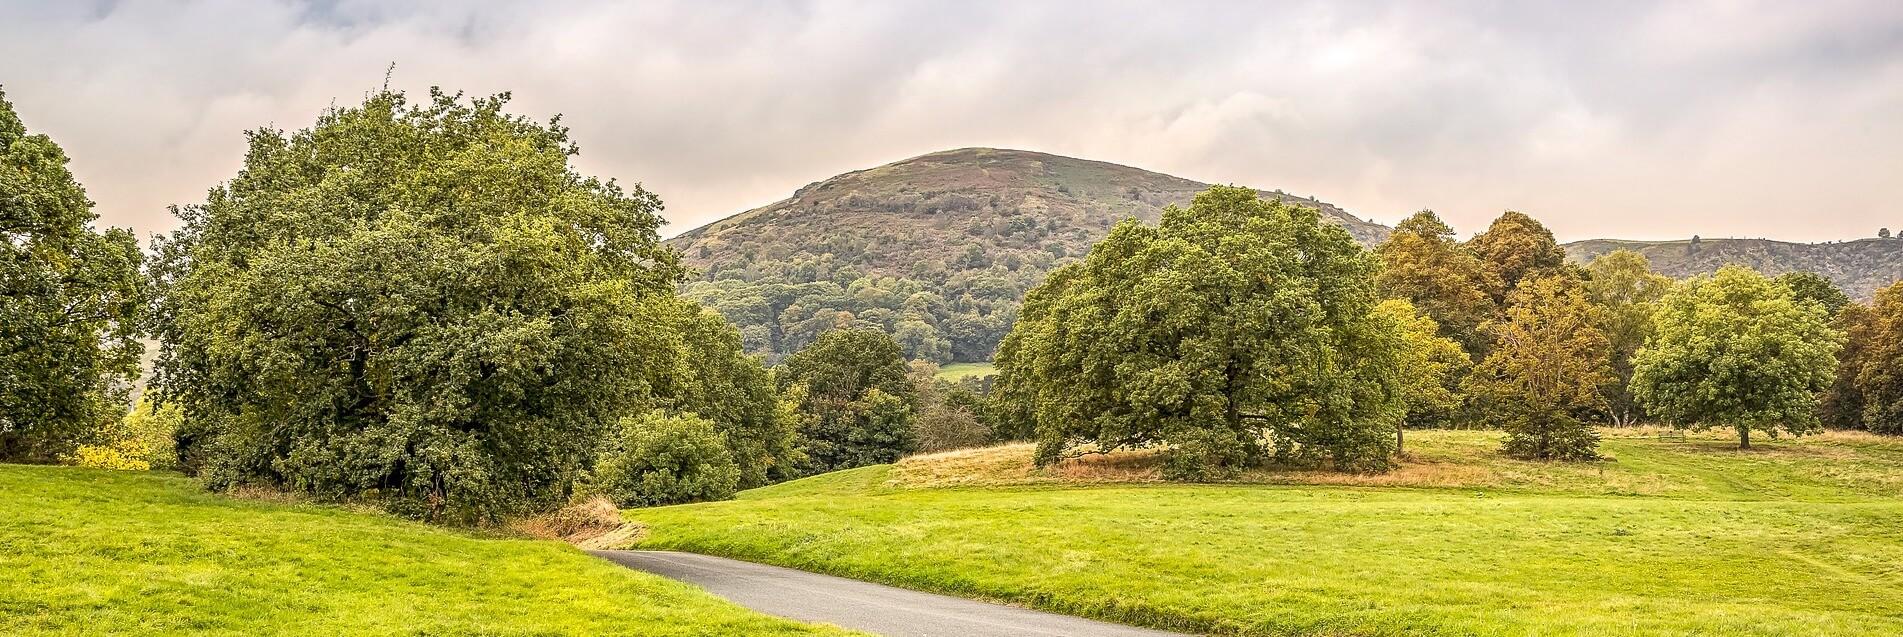 Luxury Holiday Retreats near to The Malvern Hills